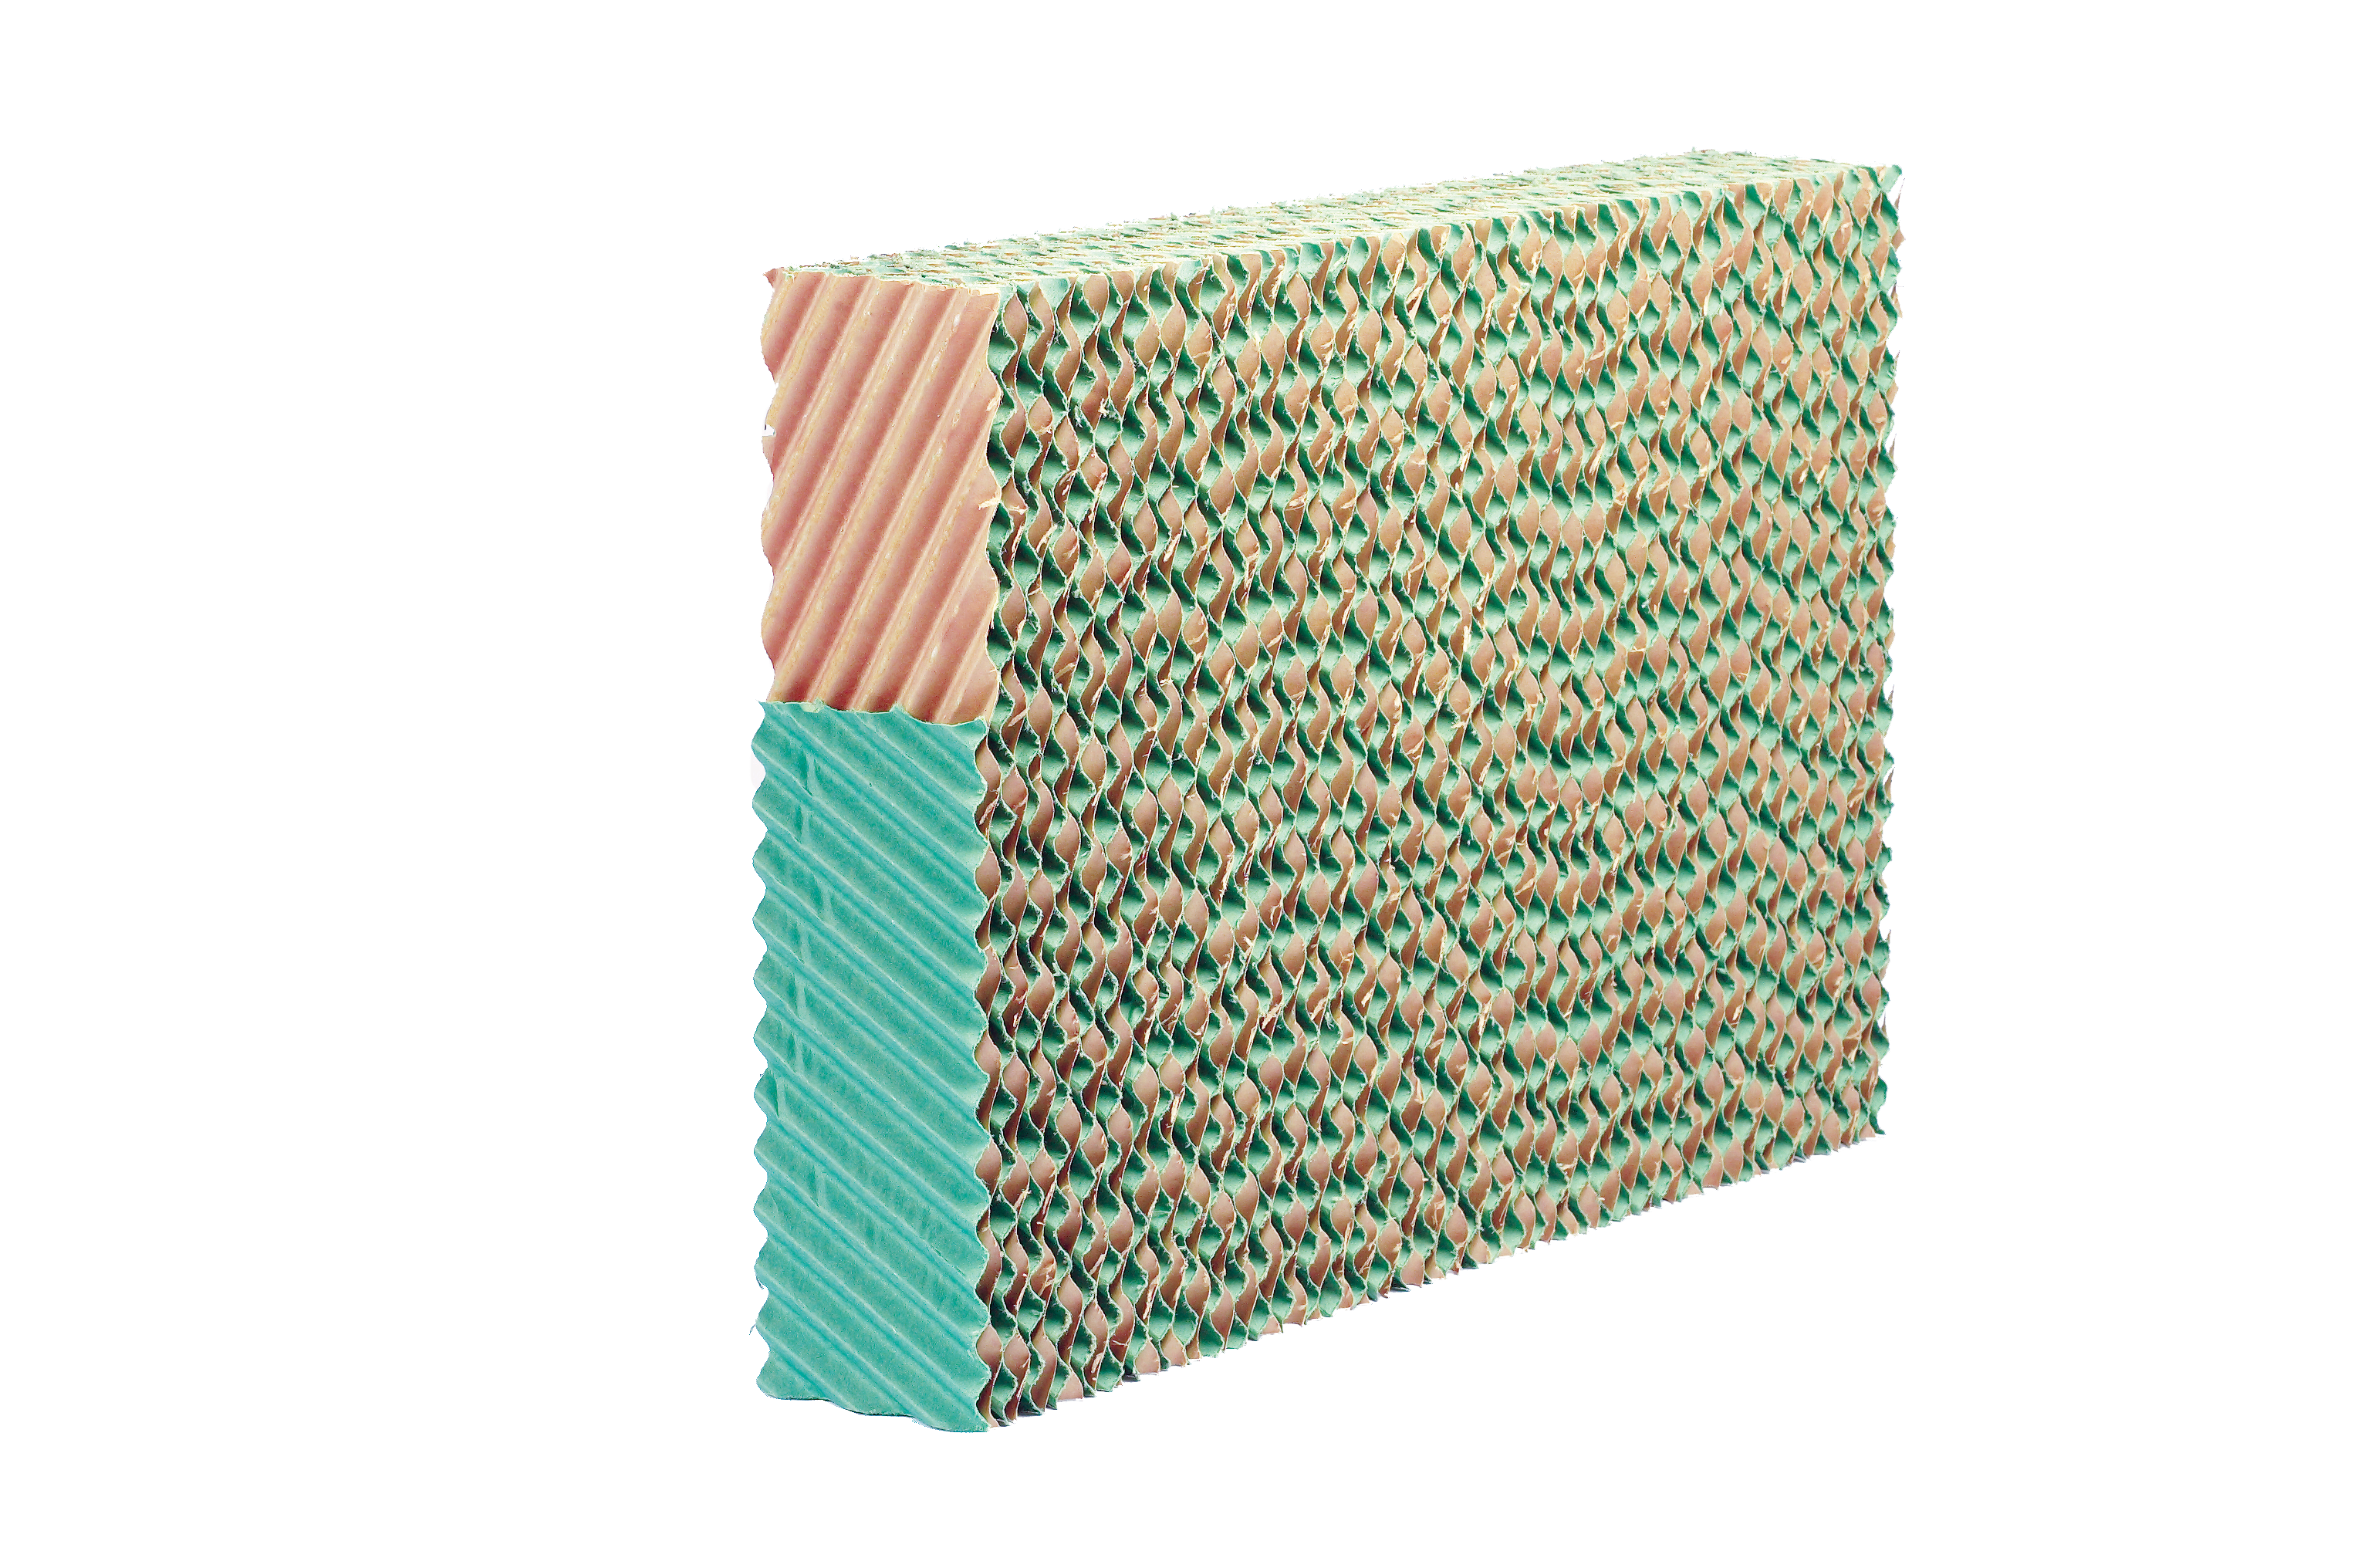 Evaporative Cooling Pads : Celdek evaporative cooling pad products munters